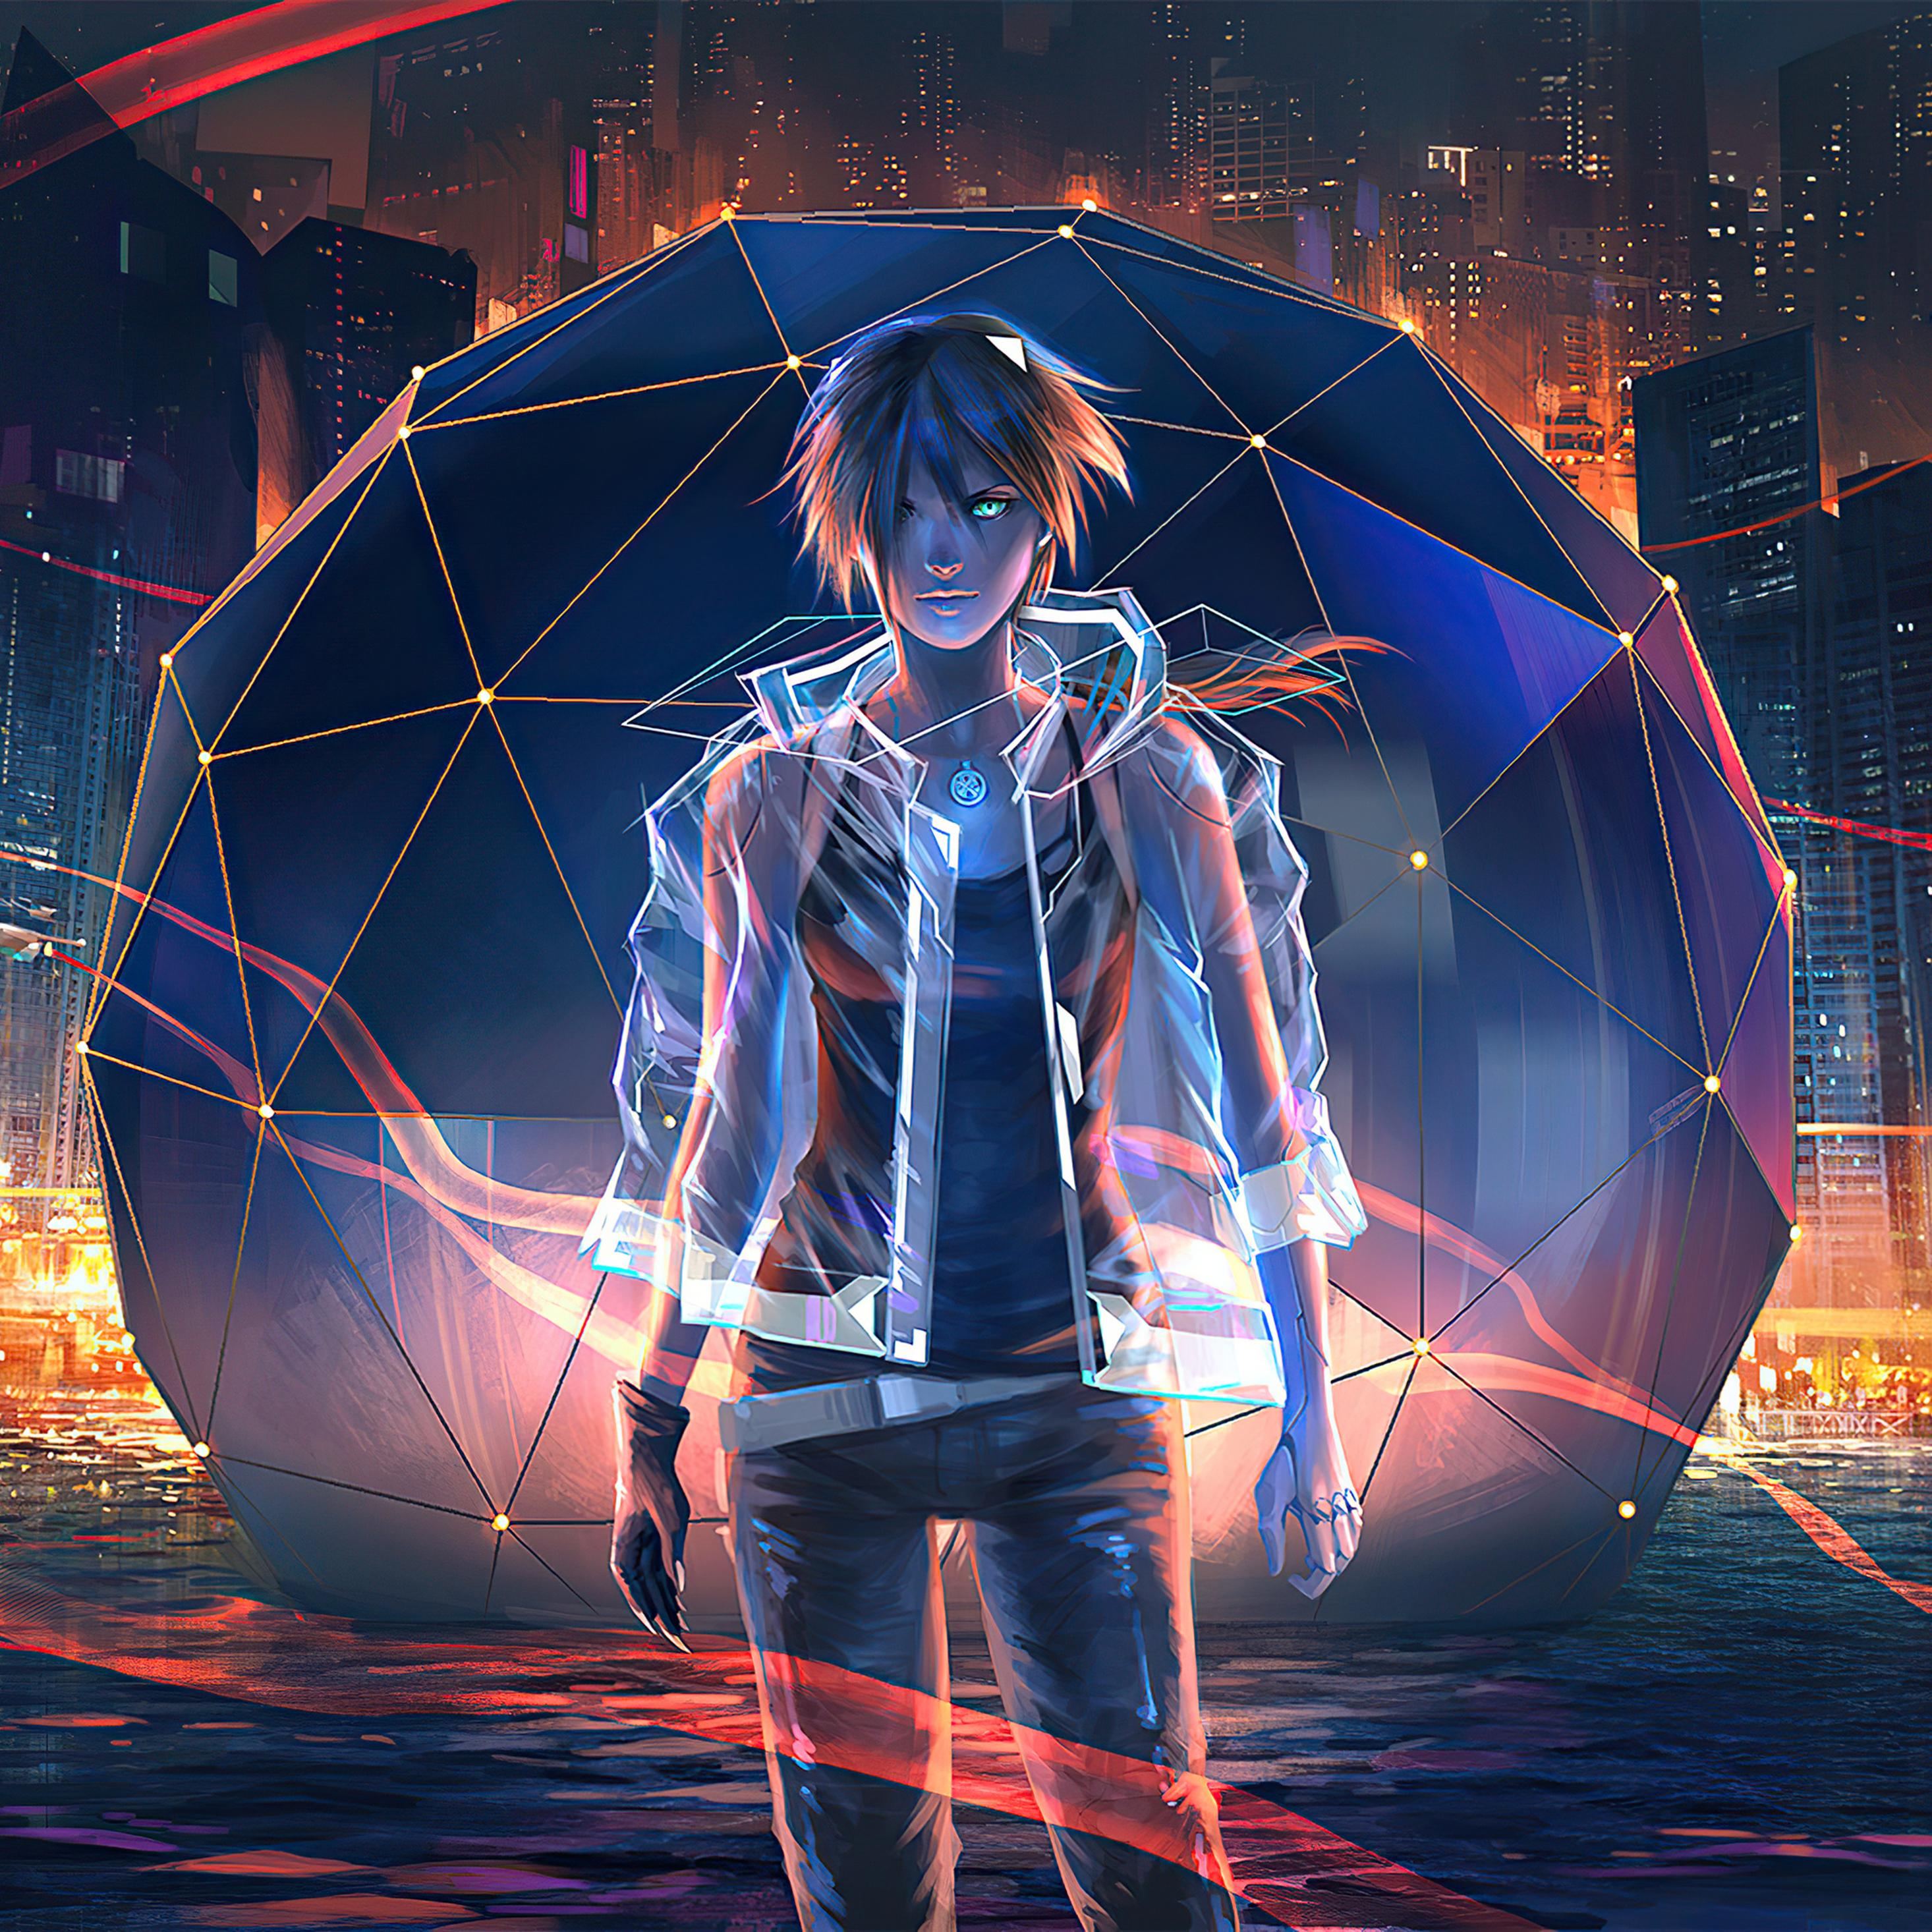 night-city-anime-boy-4k-6d.jpg